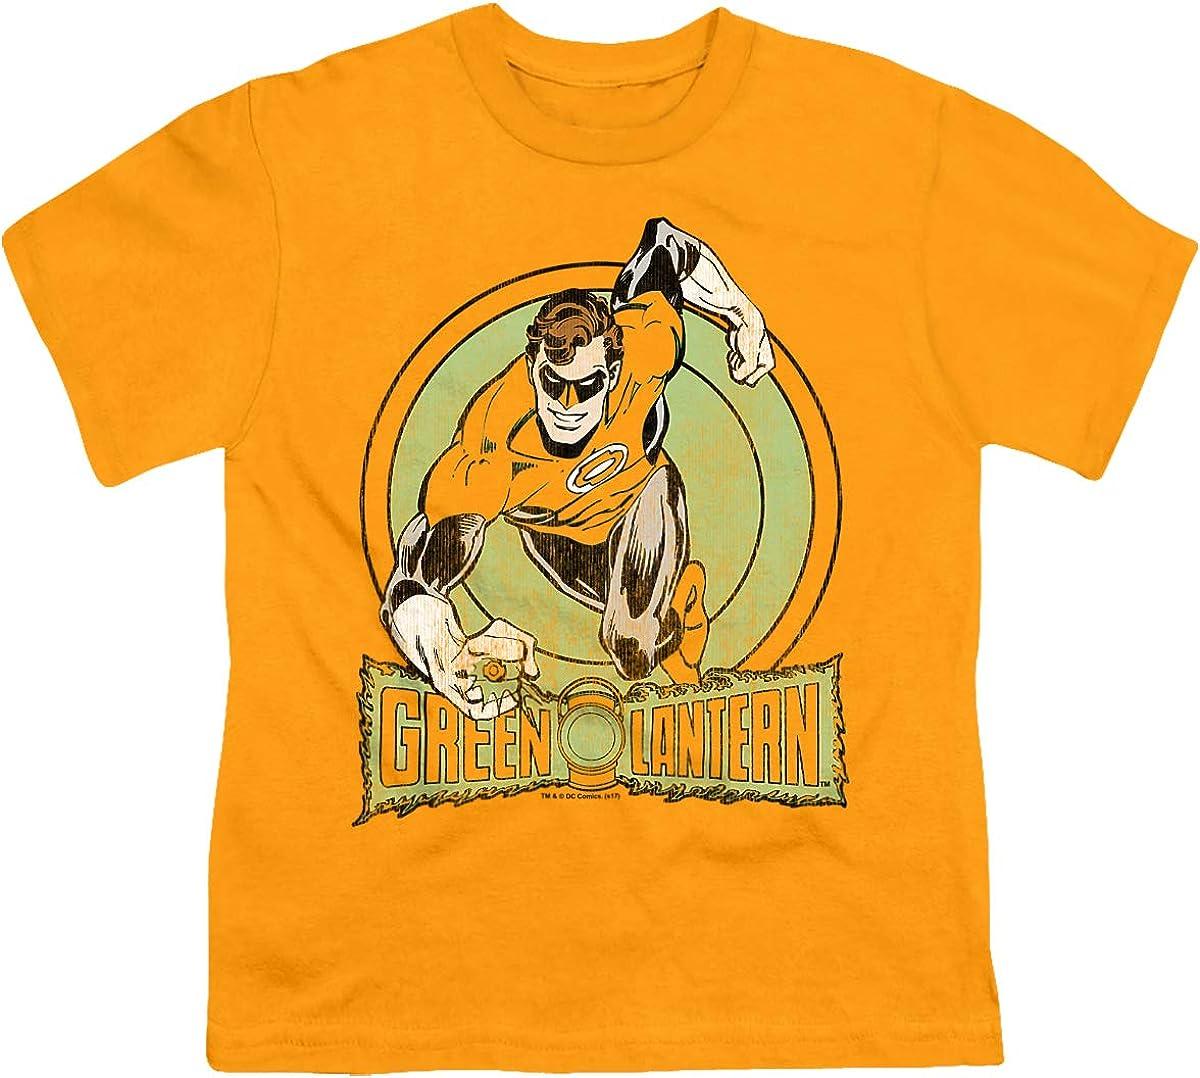 DC Green Lantern Unisex Youth T Shirt, Gold, Large